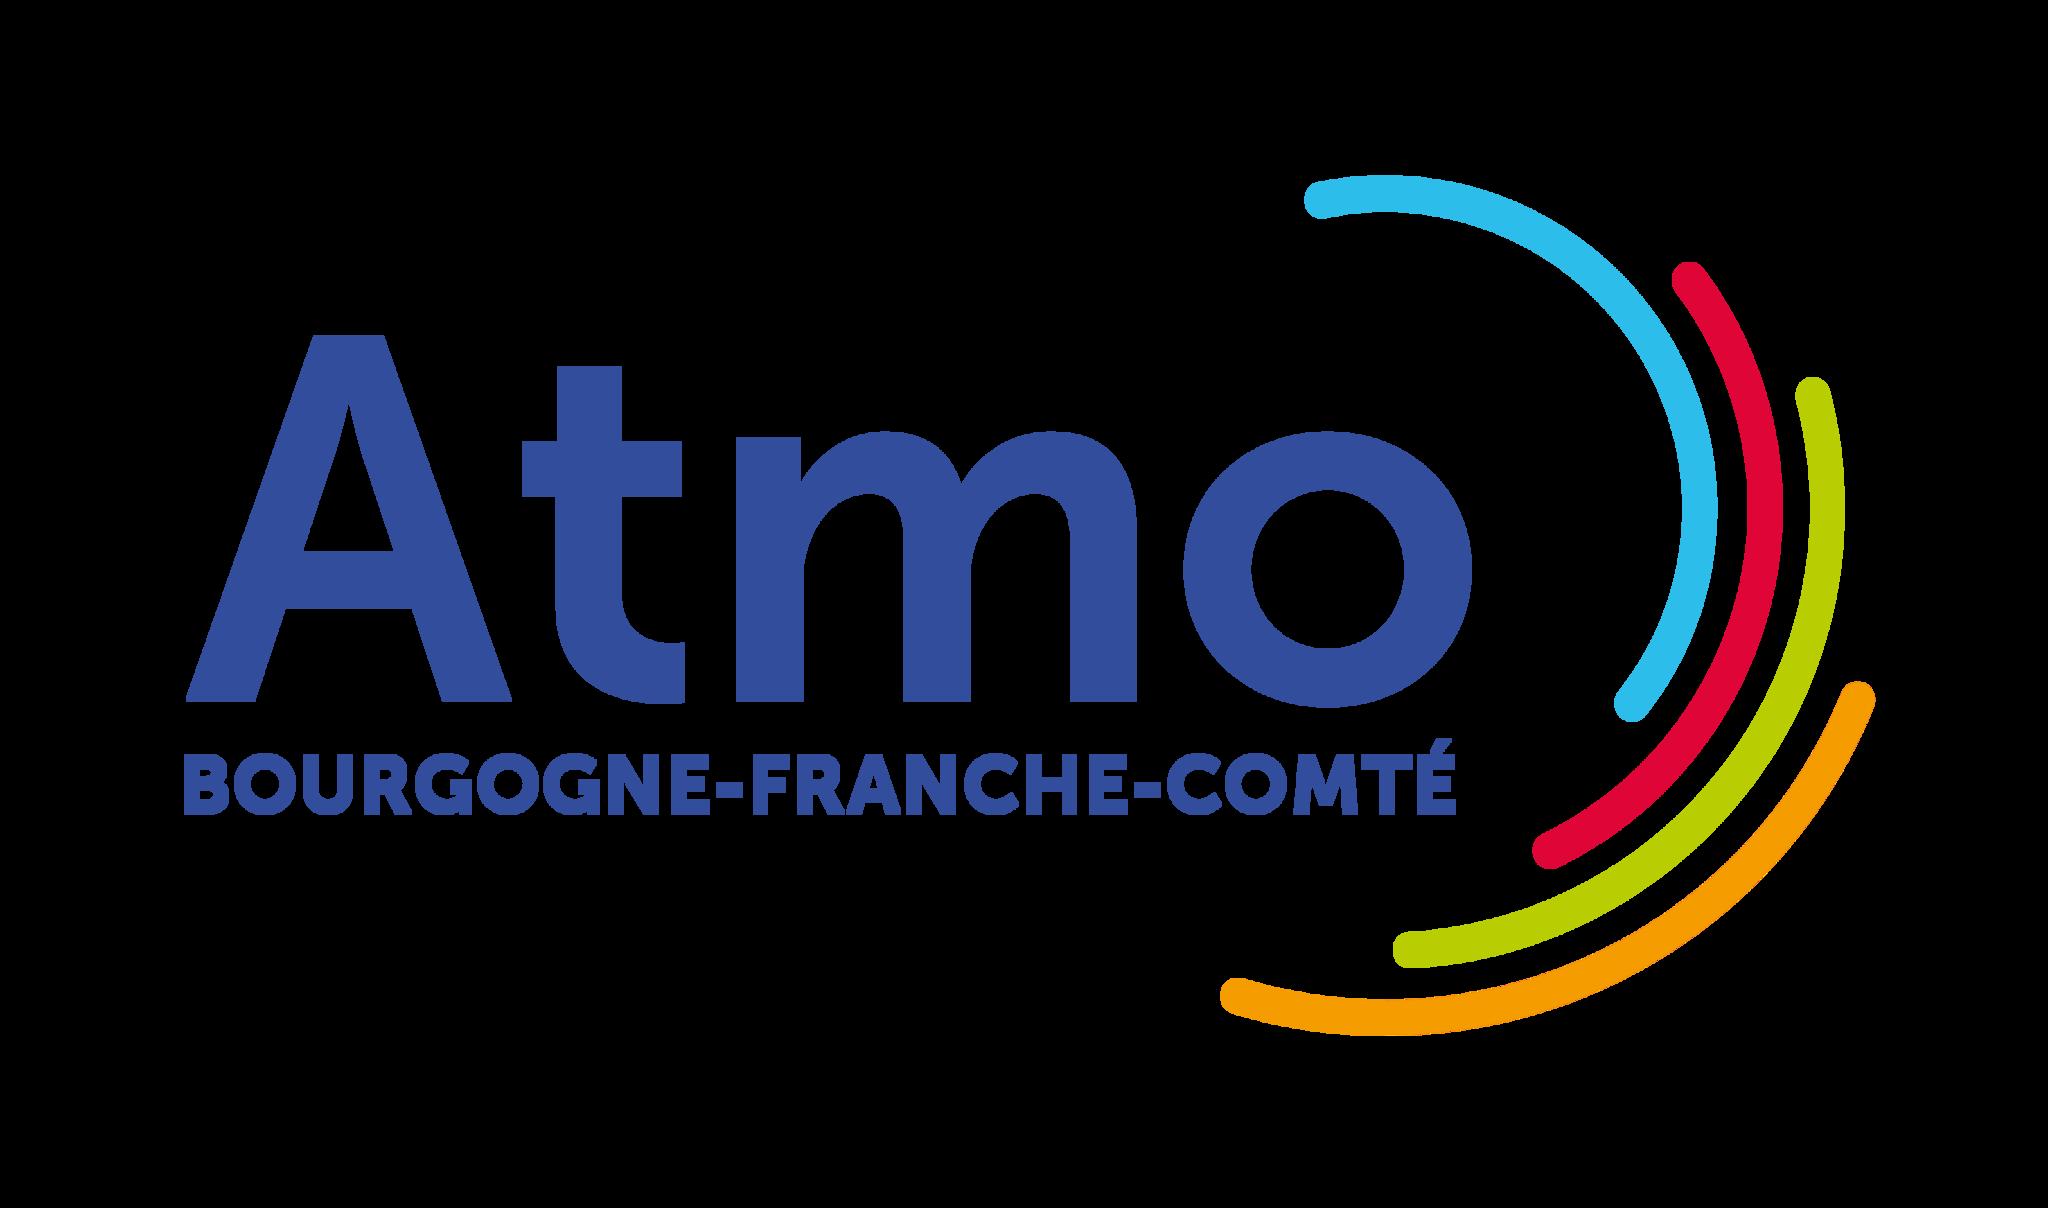 logo_atmo_bfc.png